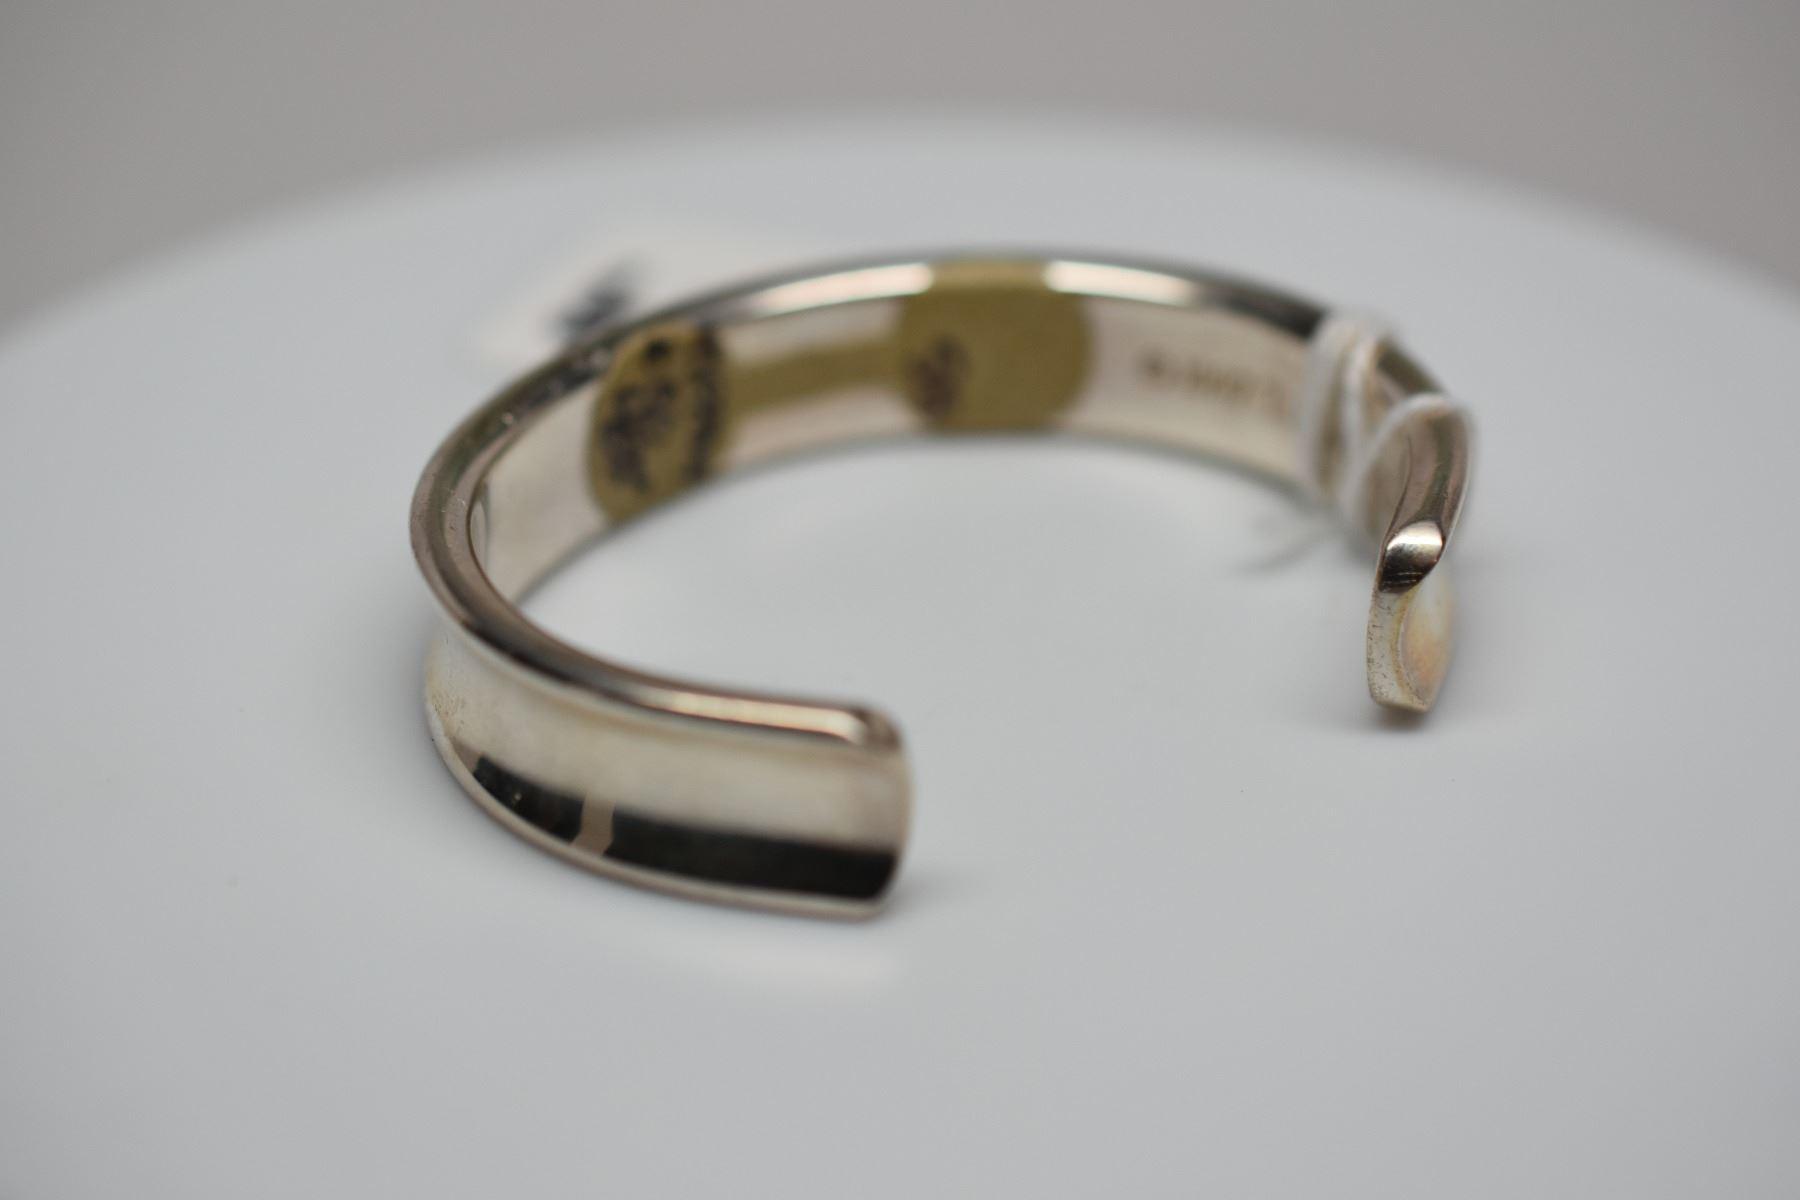 82faddd2ed42a Tiffany & Co. Sterling Silver Bangle Bracelet 2 1/2